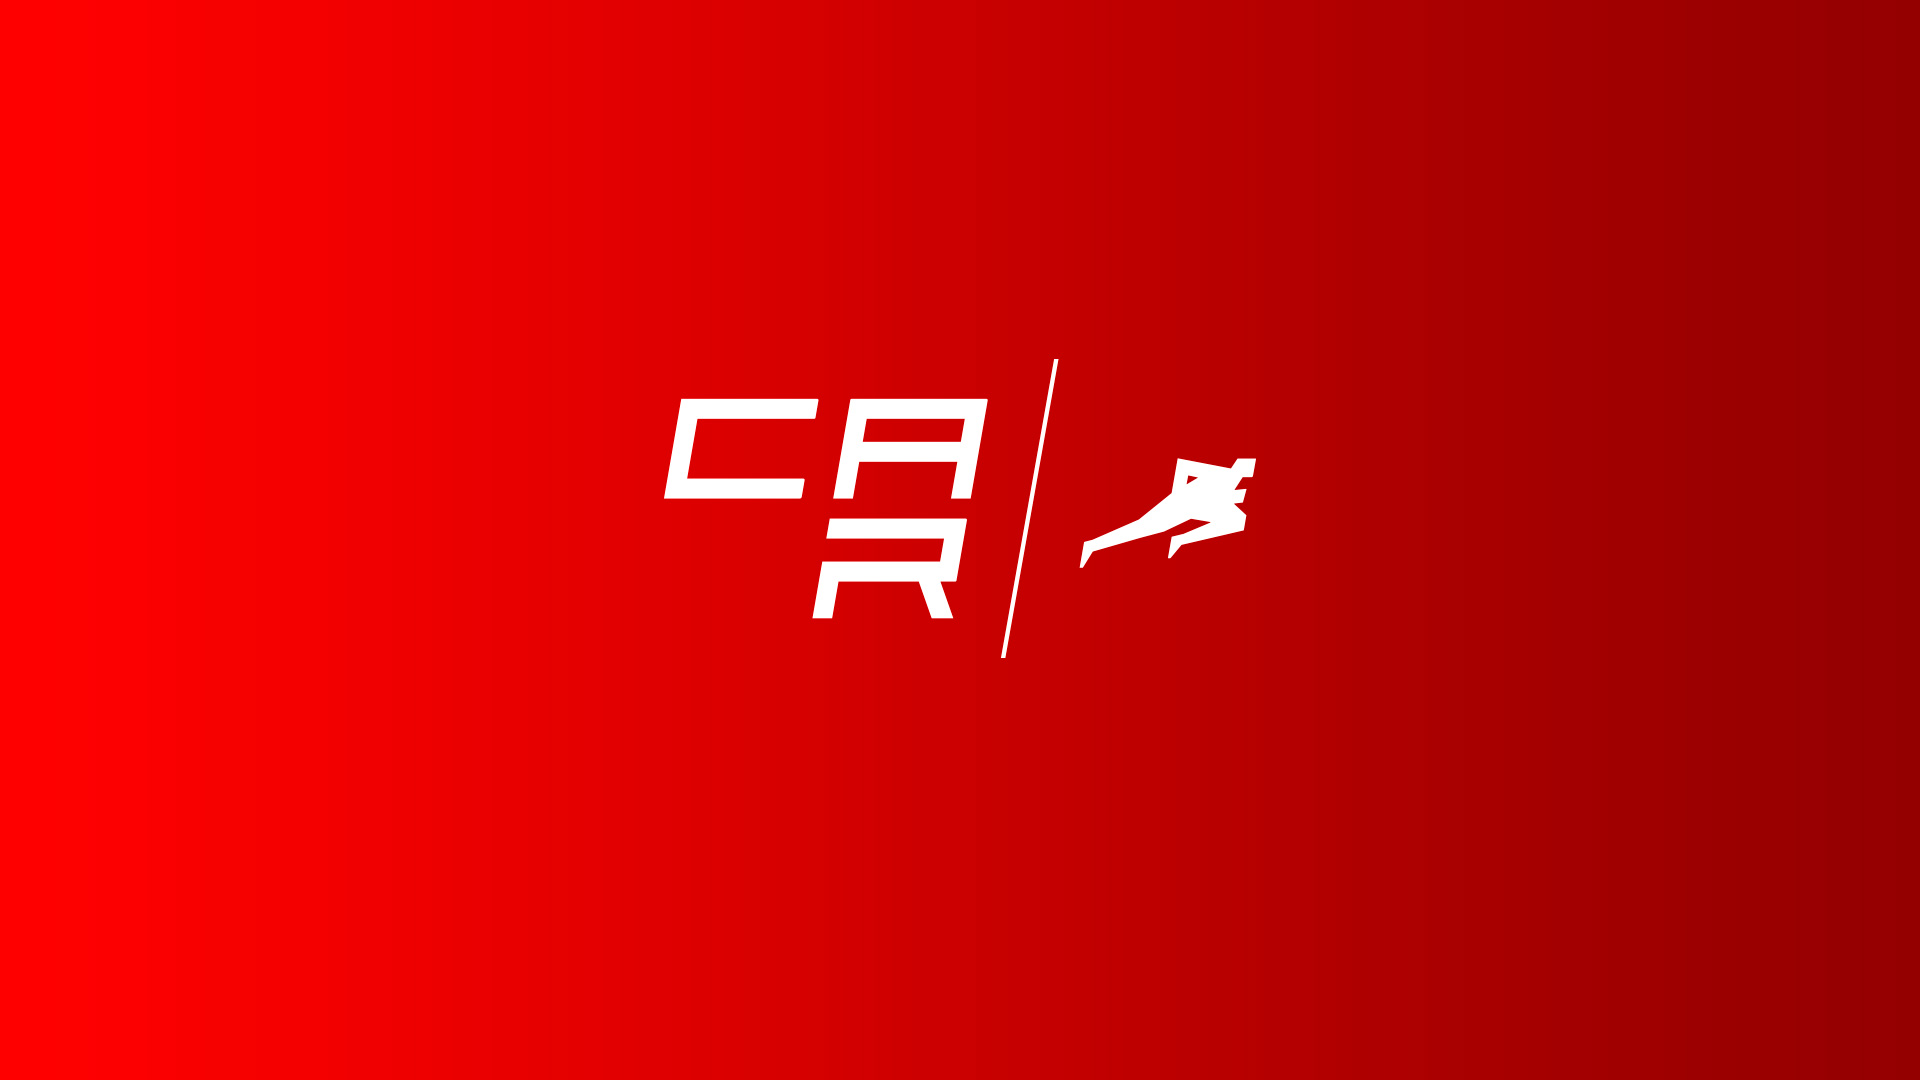 Diseño Marca e Identidad Corporativa Barcelona - CAR Sant Cugat